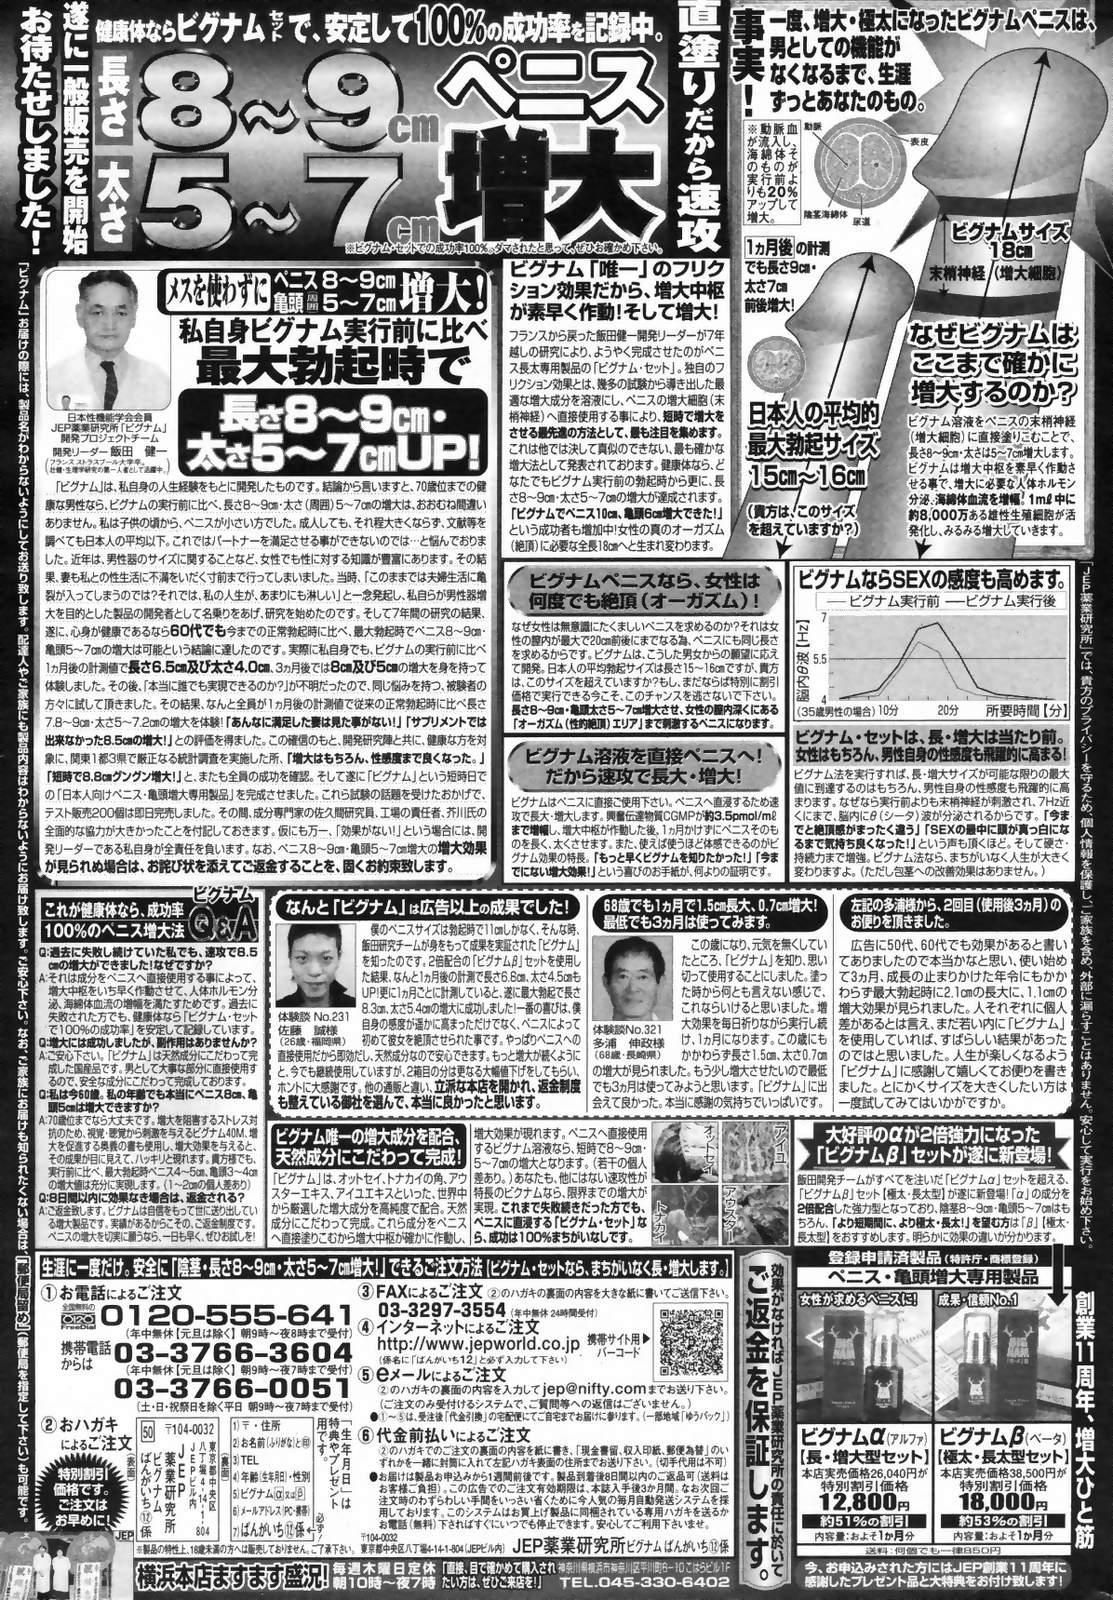 Manga Bangaichi 2009-02 Vol. 234 252